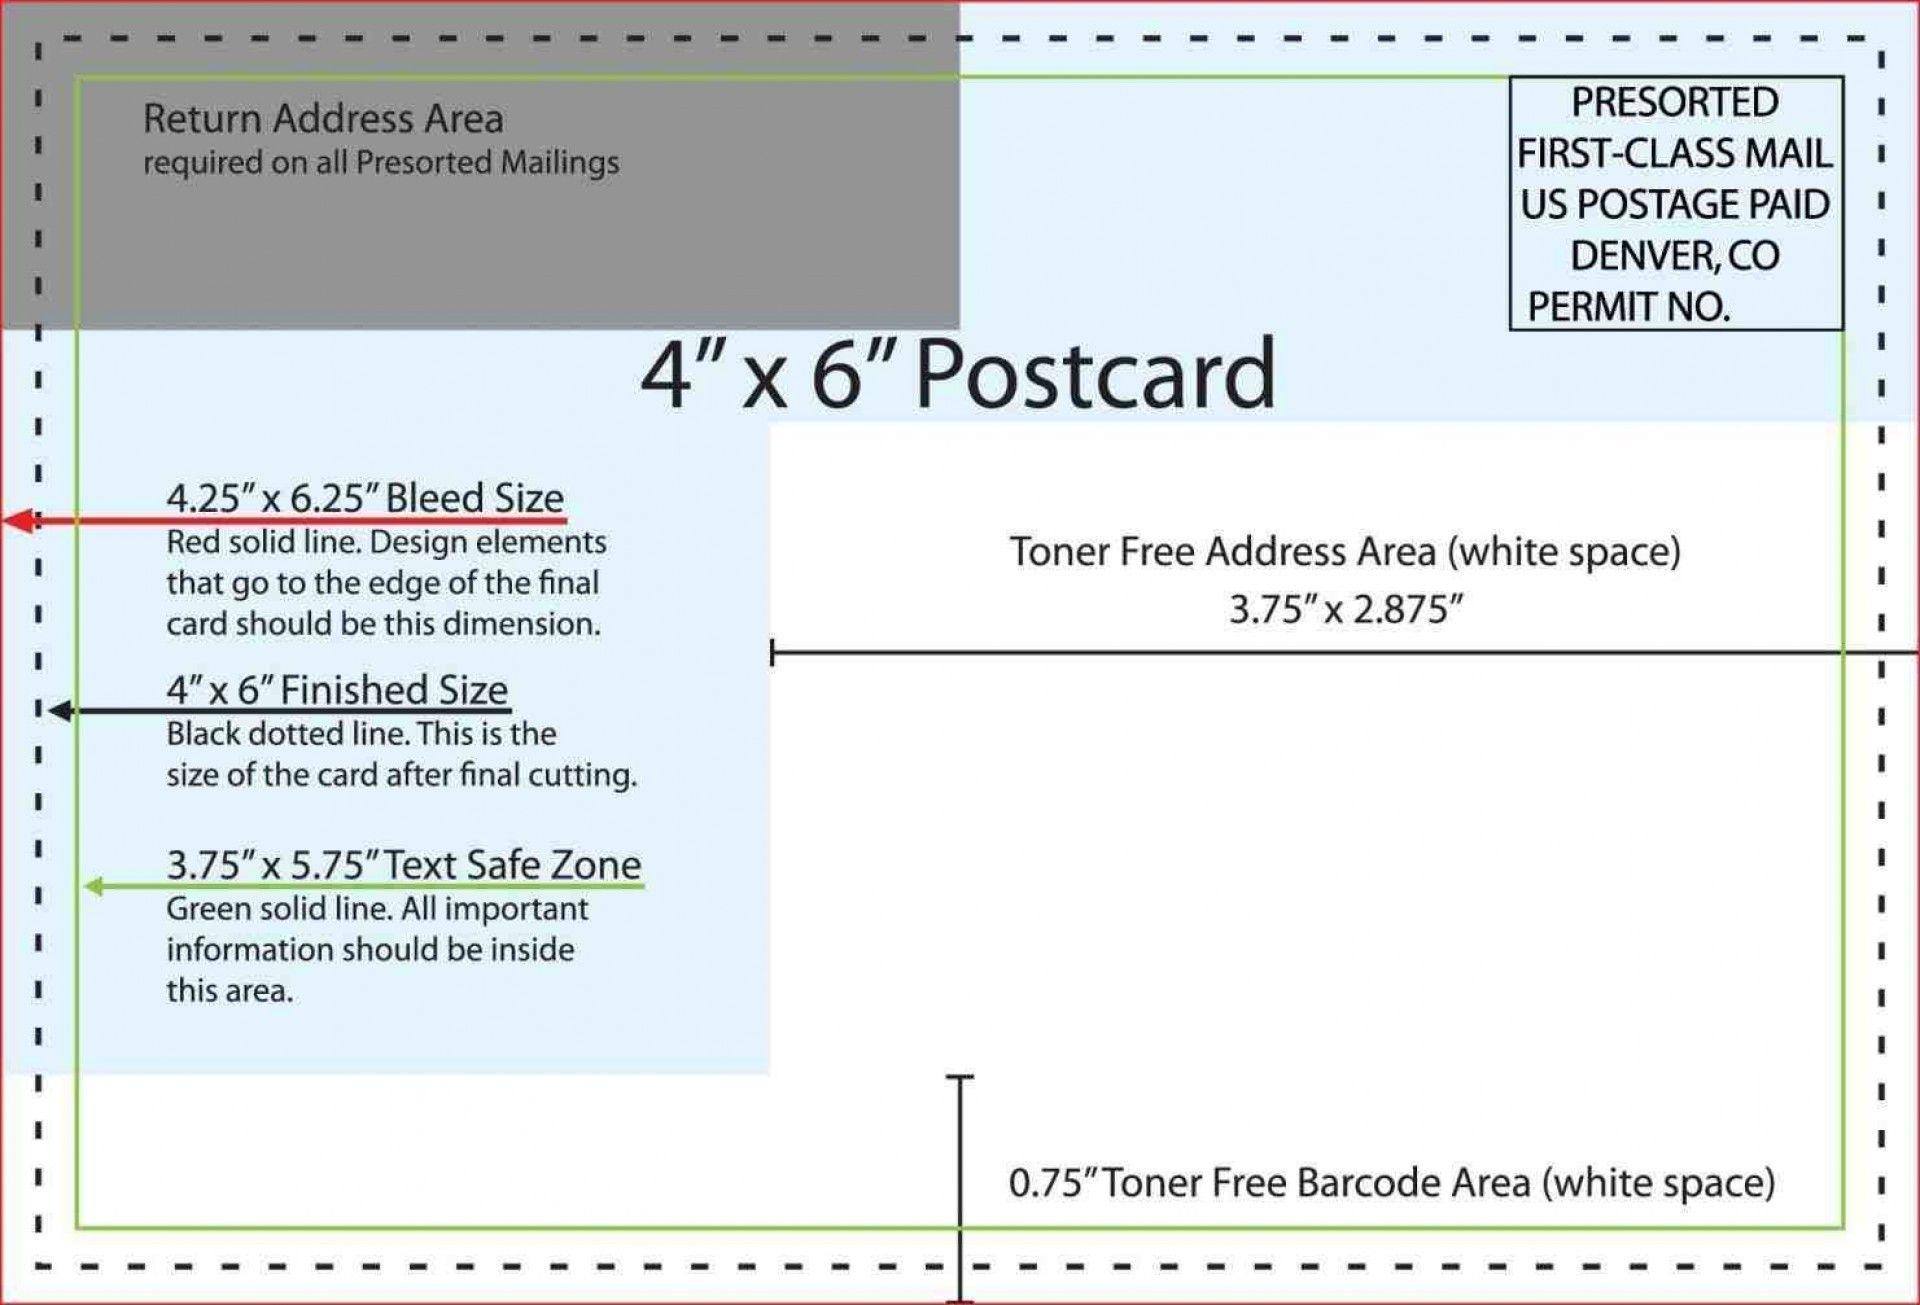 001 Template Ideas X Templates 4x6 Card Resume Postcard Regarding Microsoft Word 4x6 Postca Postcard Template Free Postcard Template Postcard Template Business